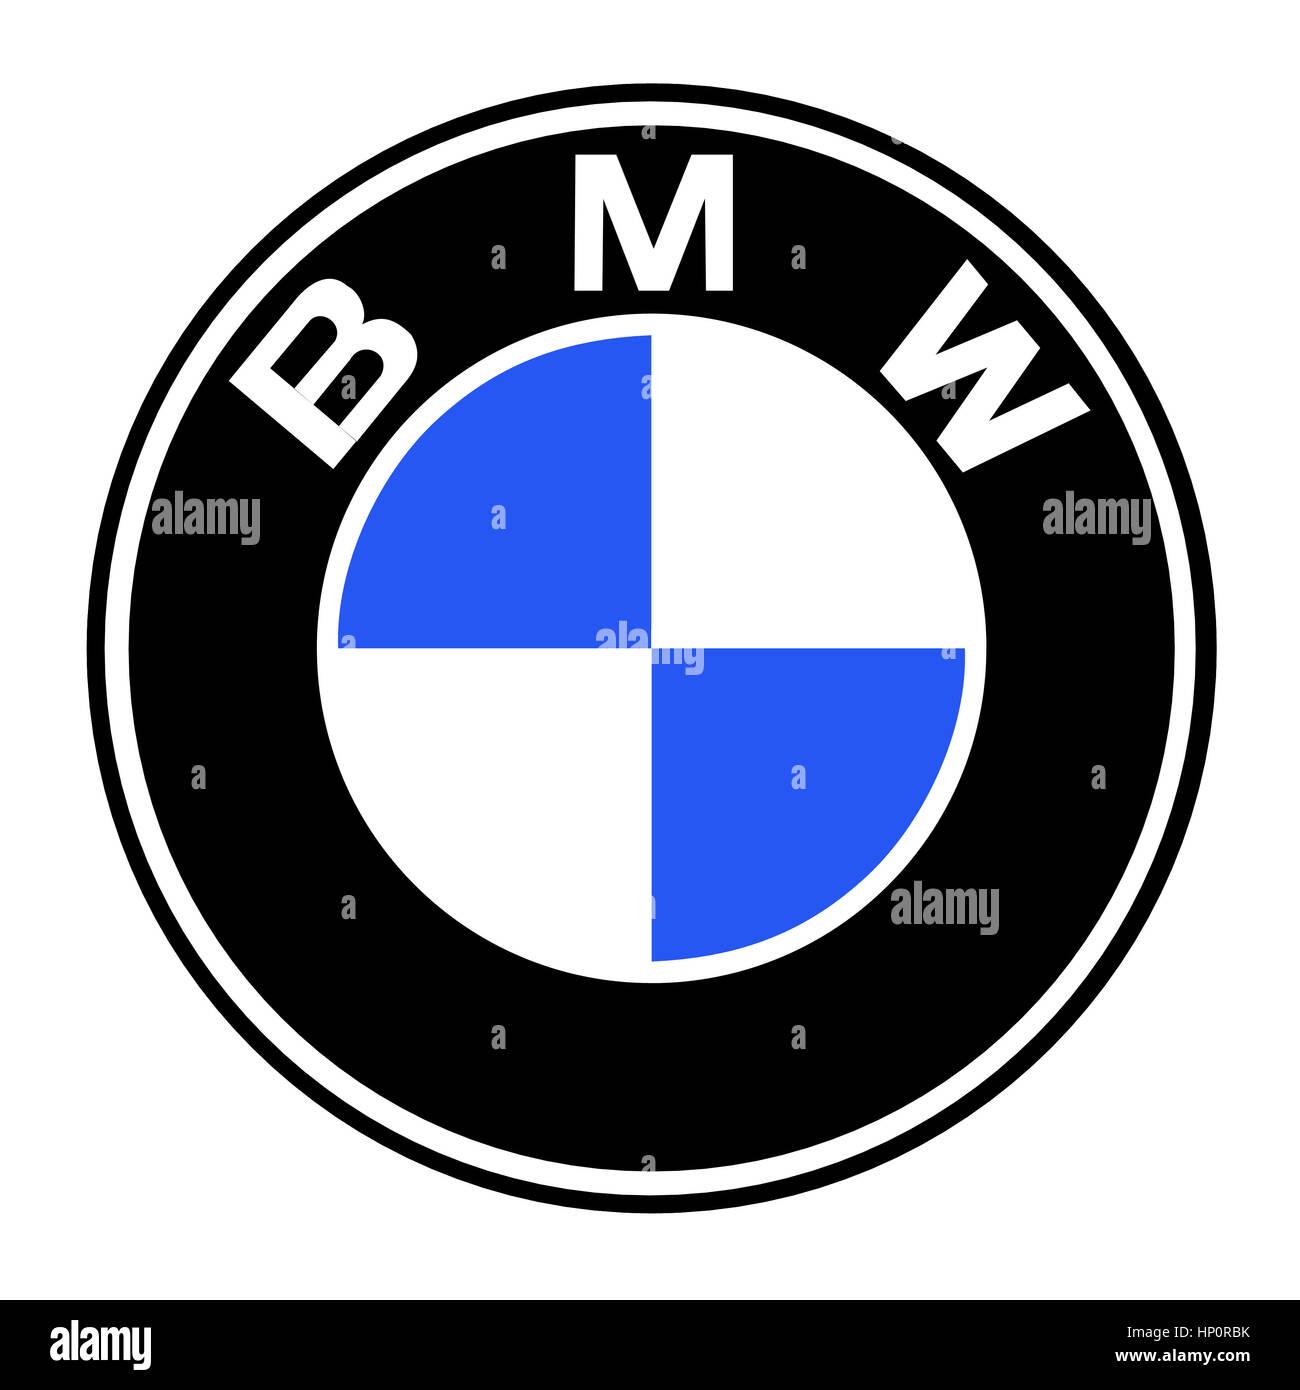 bmw logo stockfoto bild 134013367 alamy. Black Bedroom Furniture Sets. Home Design Ideas